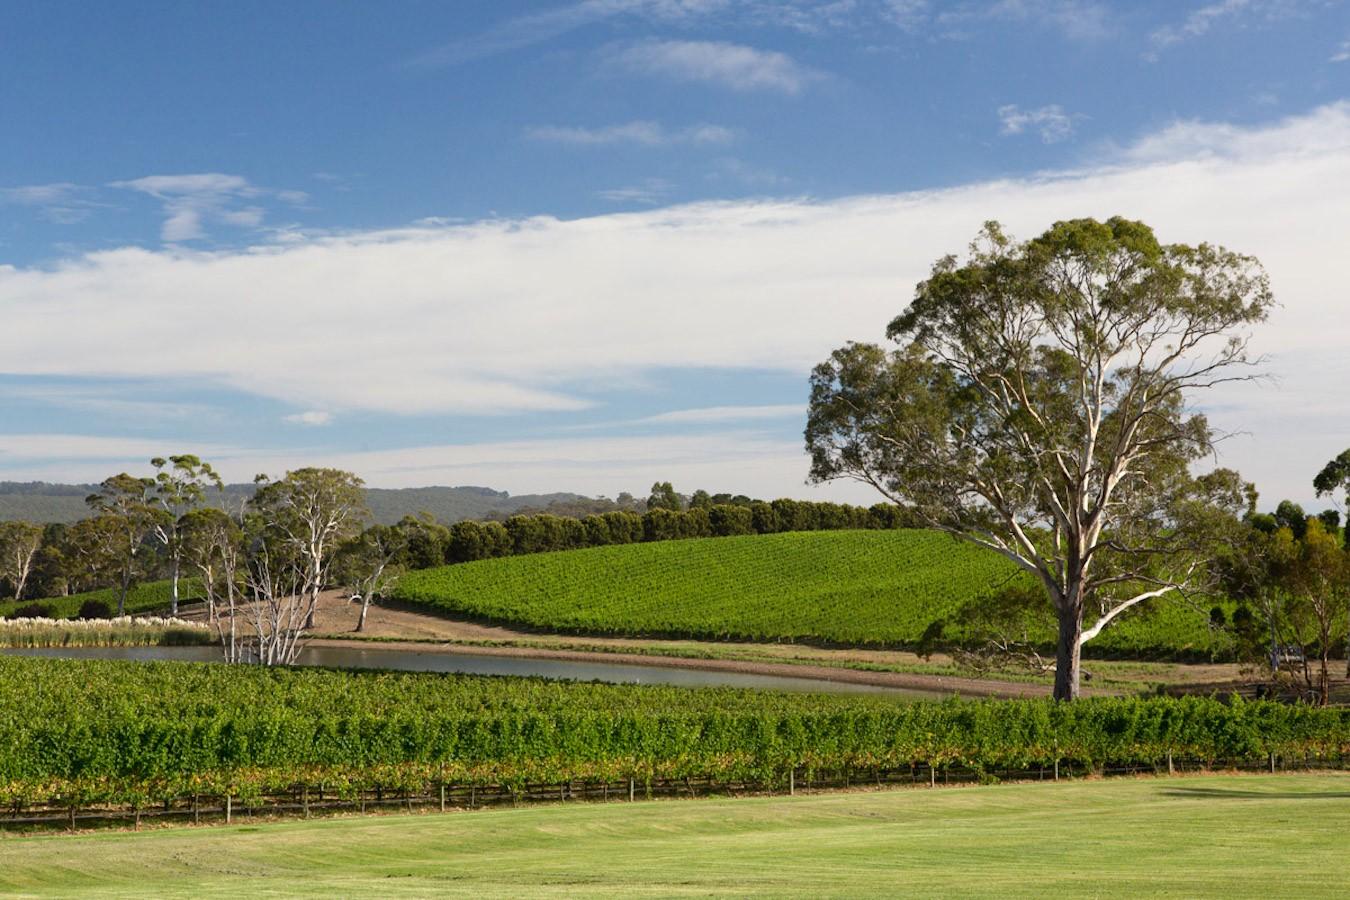 Where else but Australia? The beautiful Adelaide Hills